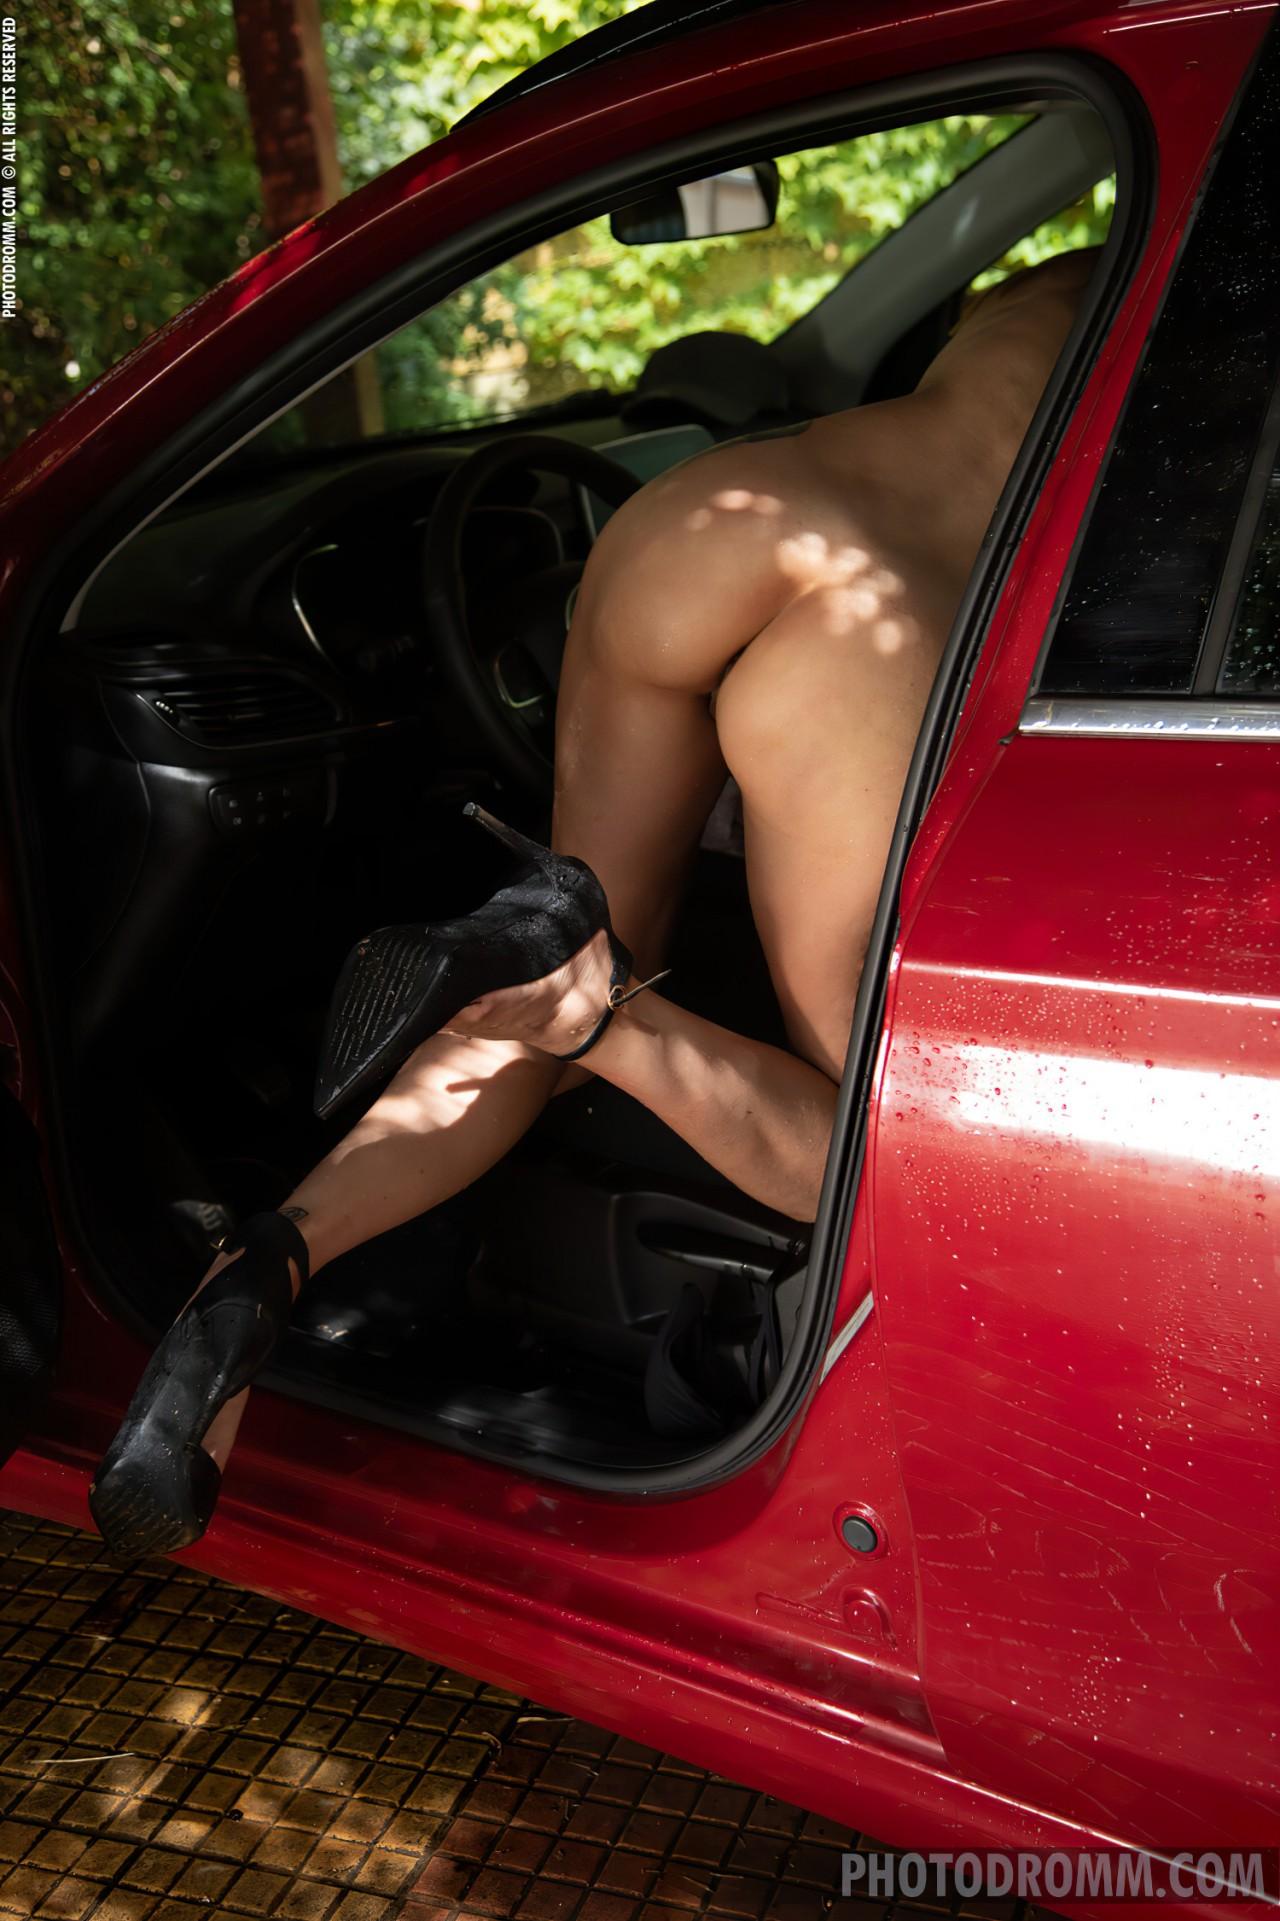 Mulher Lavando Carro Nua (11)